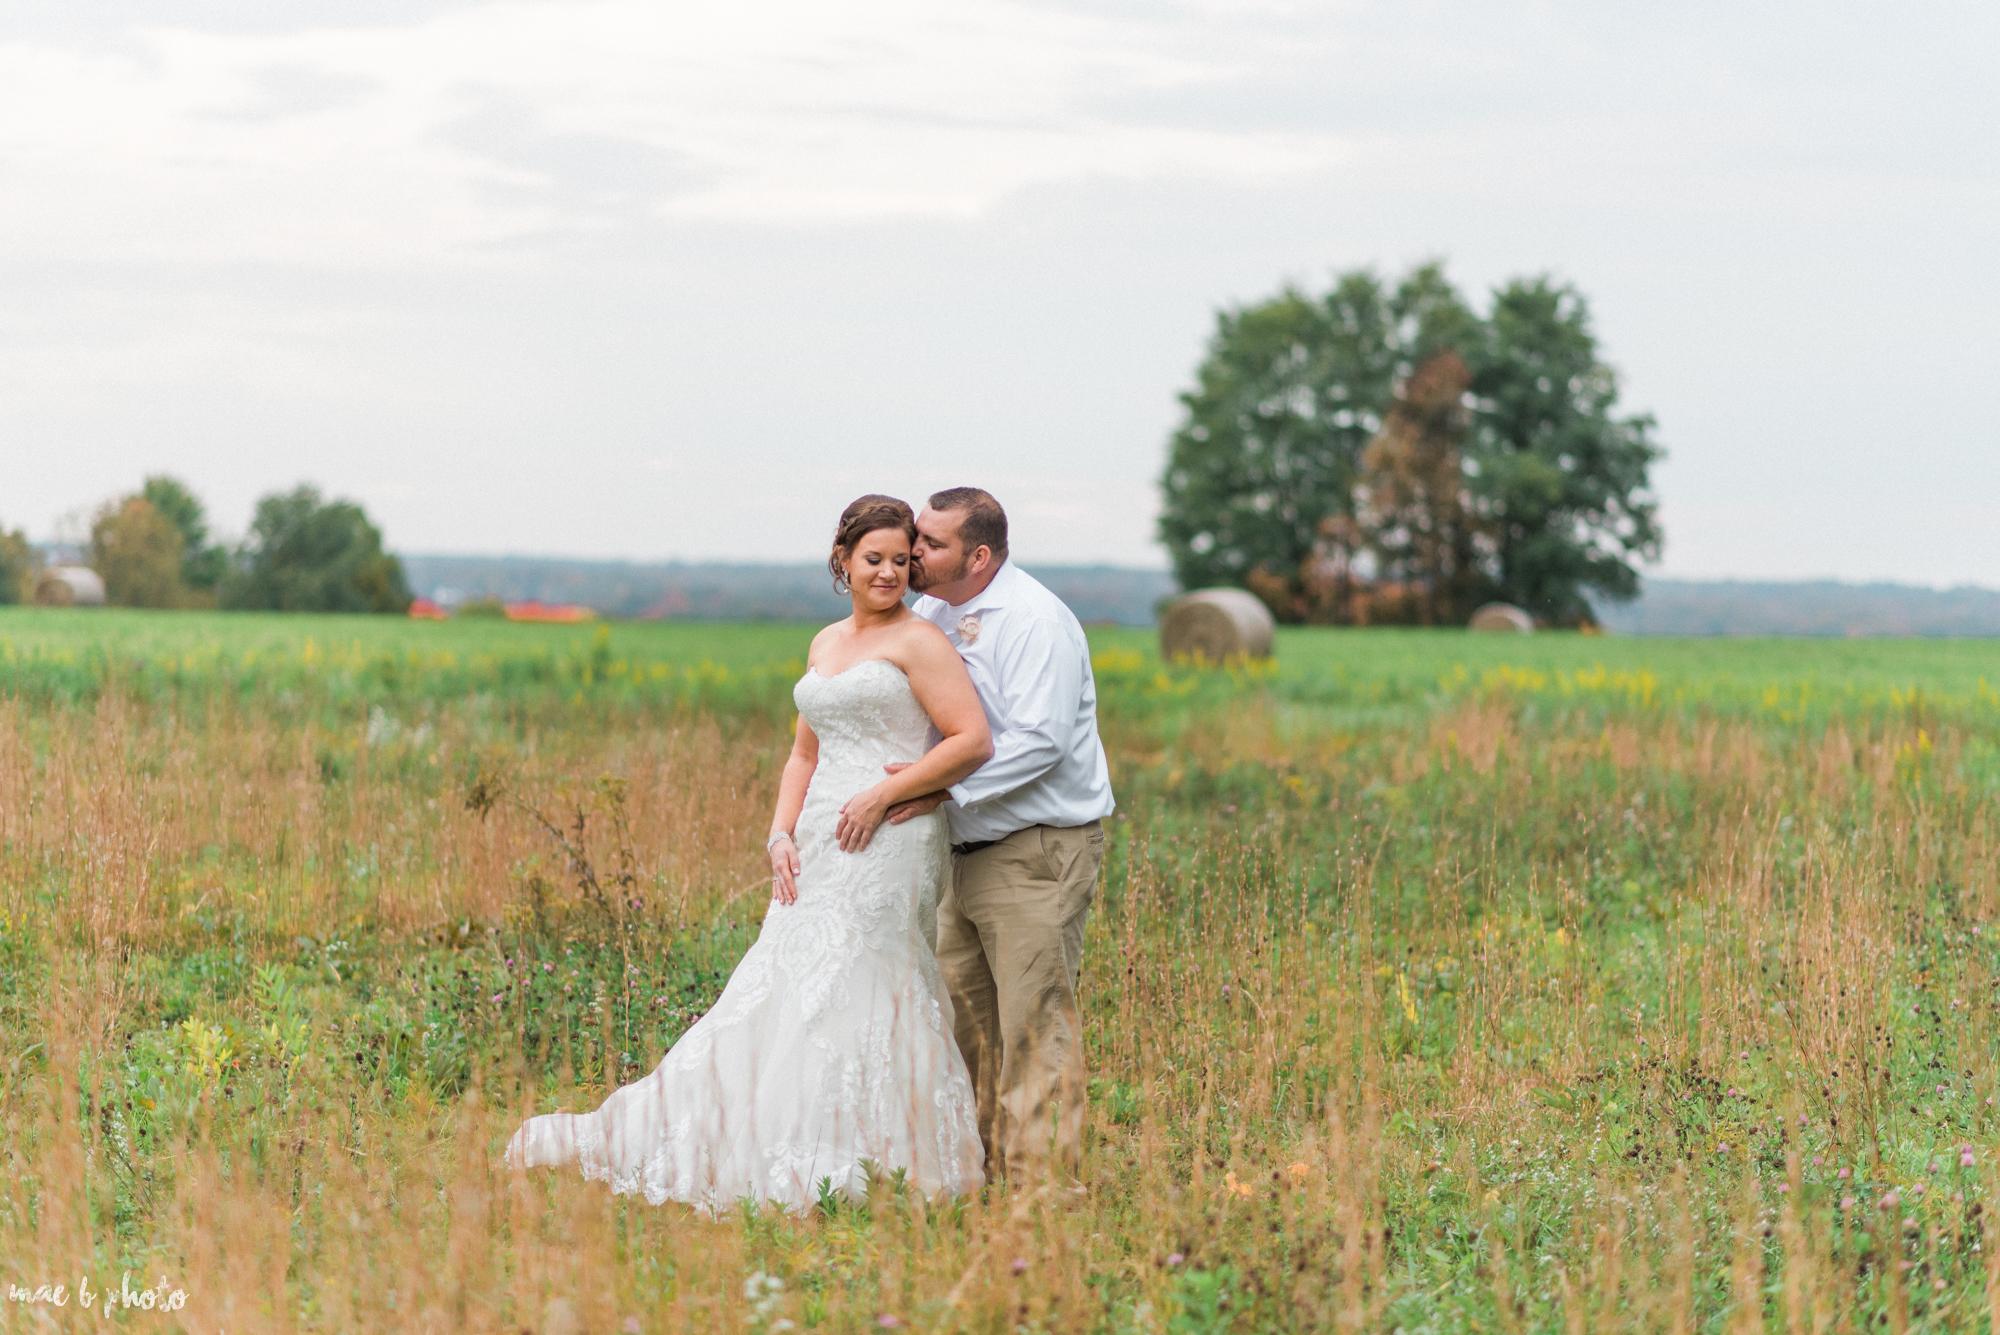 Sarah & Dustin's Rustic Chic Barn Wedding at Hartford Hill Winery in Hartford, Ohio by Mae B Photo-73.jpg